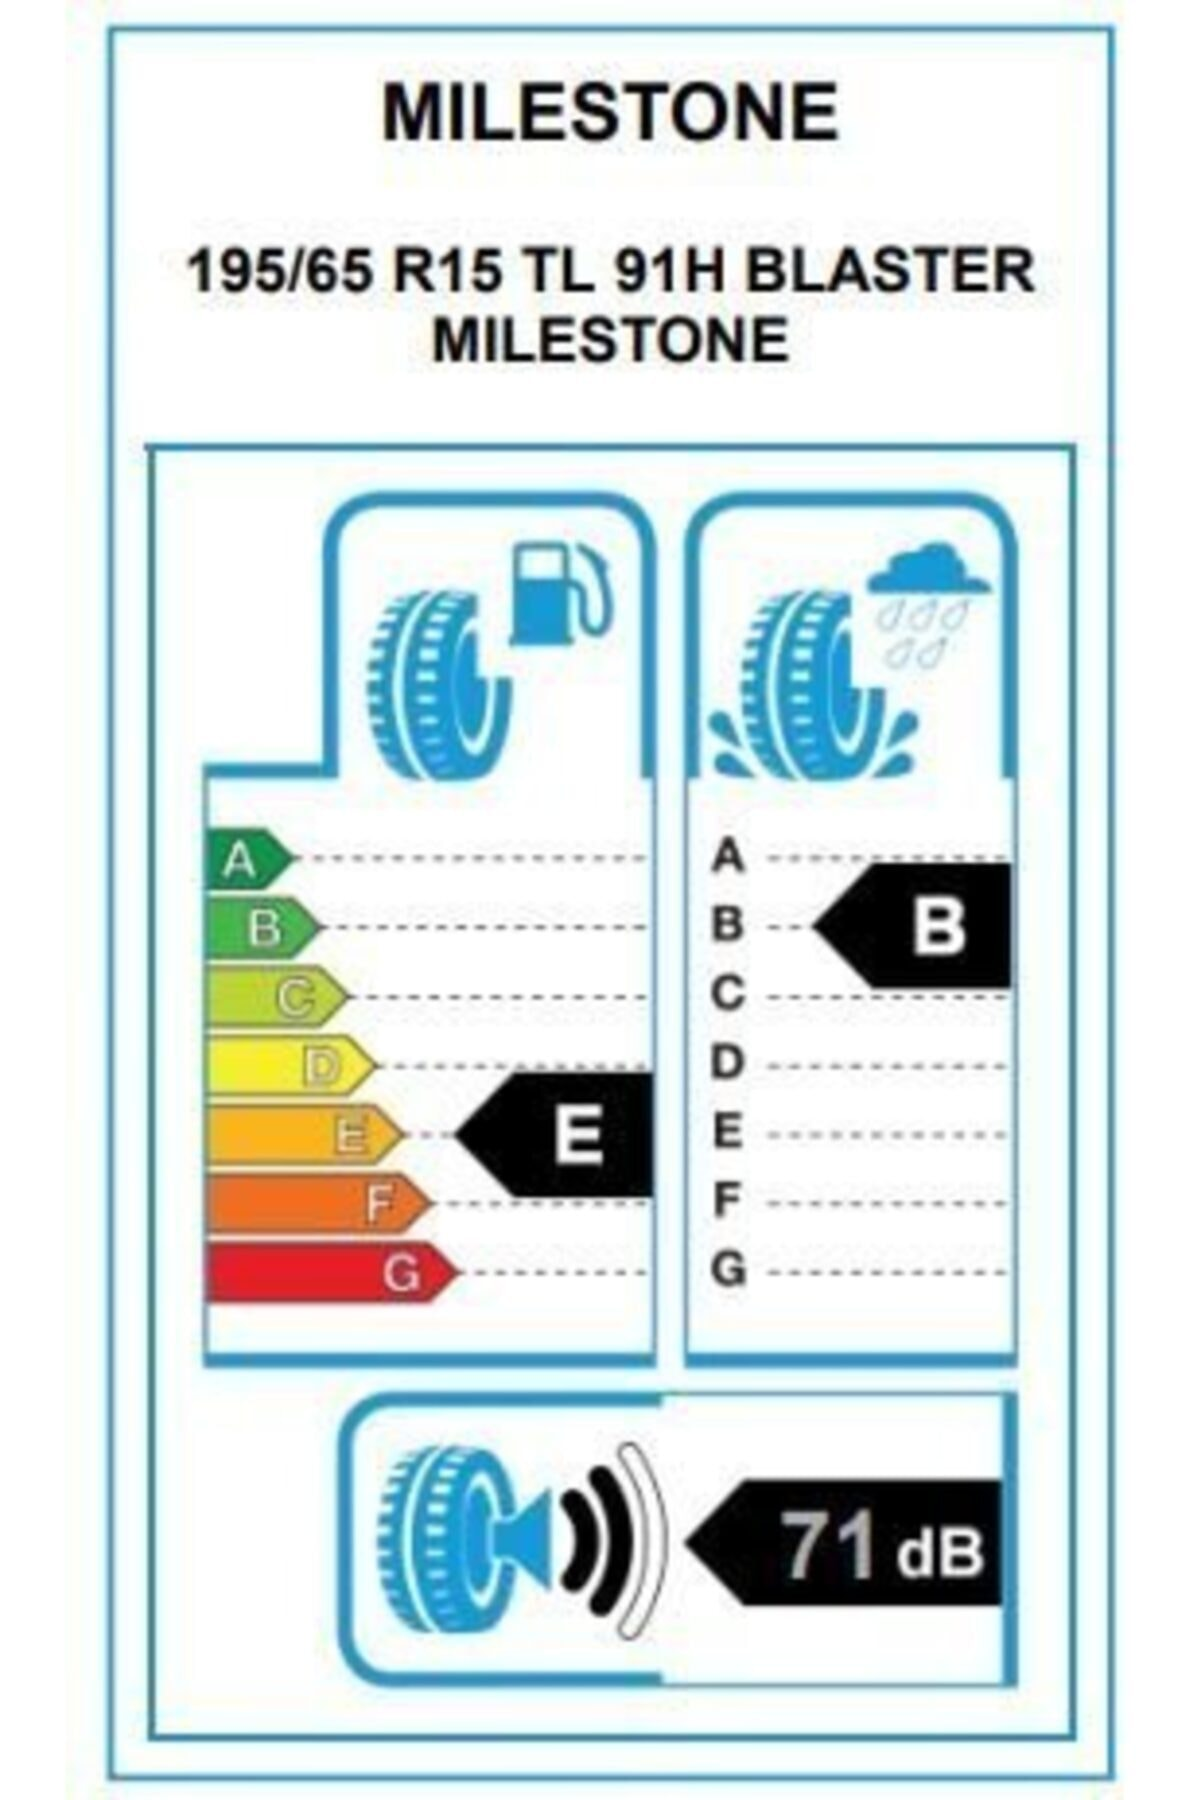 Milestone Mılestone 195/65 R15 91h Blaster Yaz Lastiği 2021 Üretimi 2